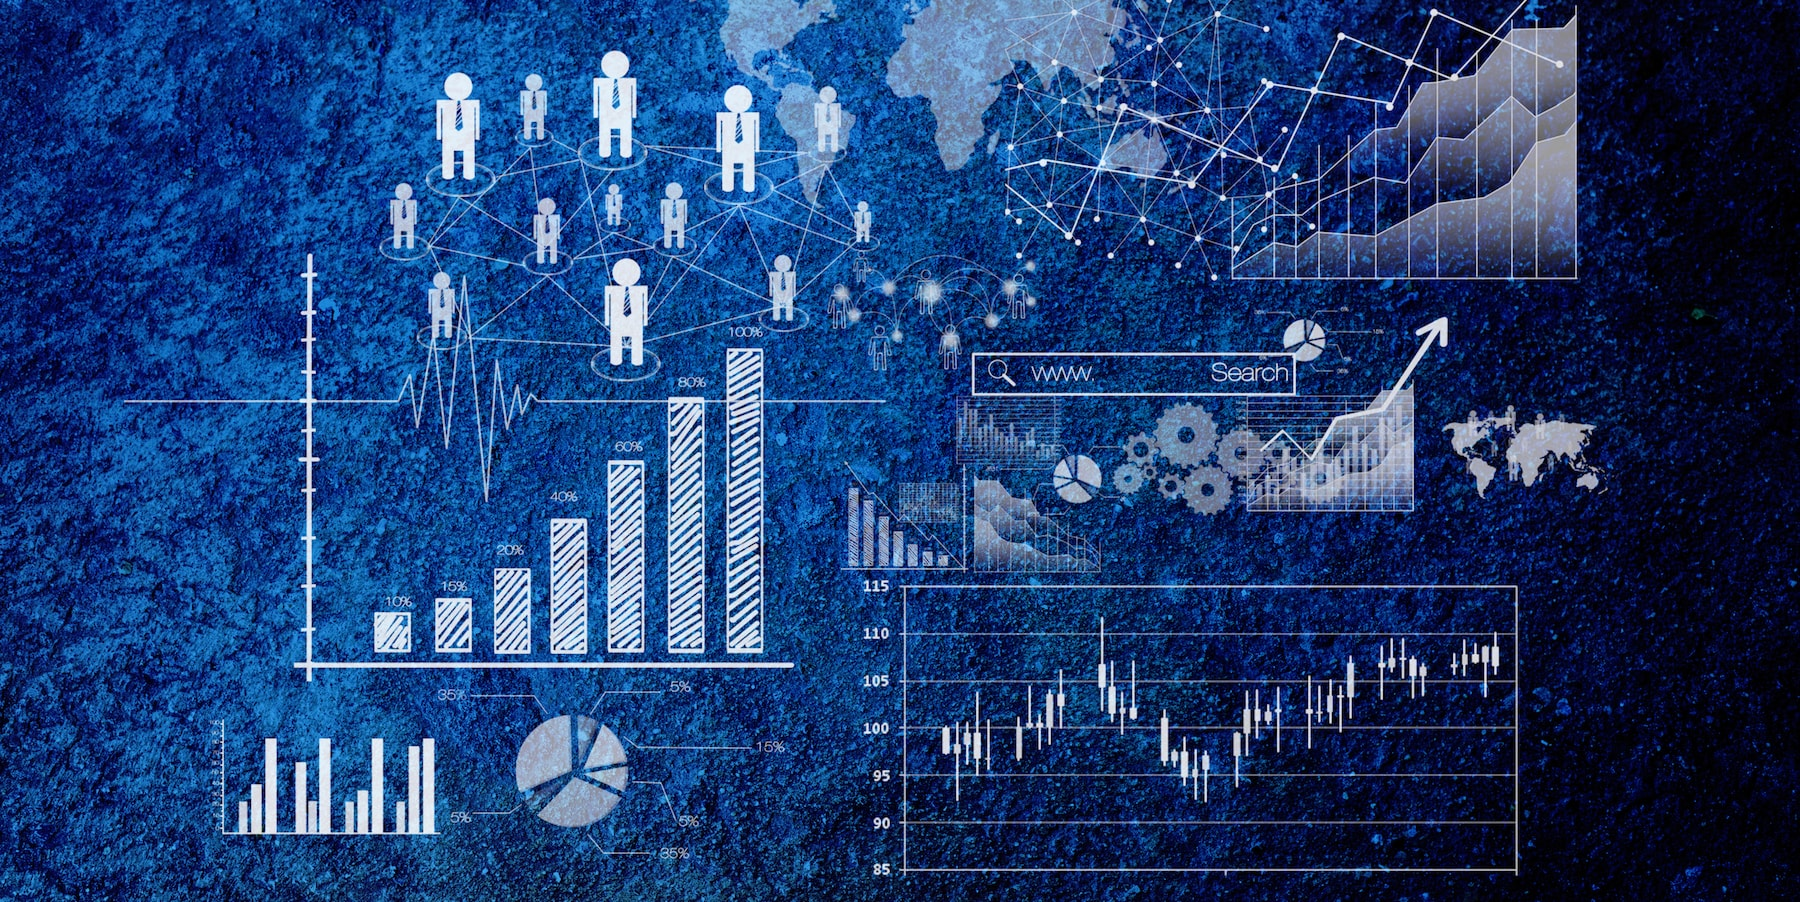 4 Keys to Data-Driven Marketing, According to Deloitte CMO Alicia Hatch